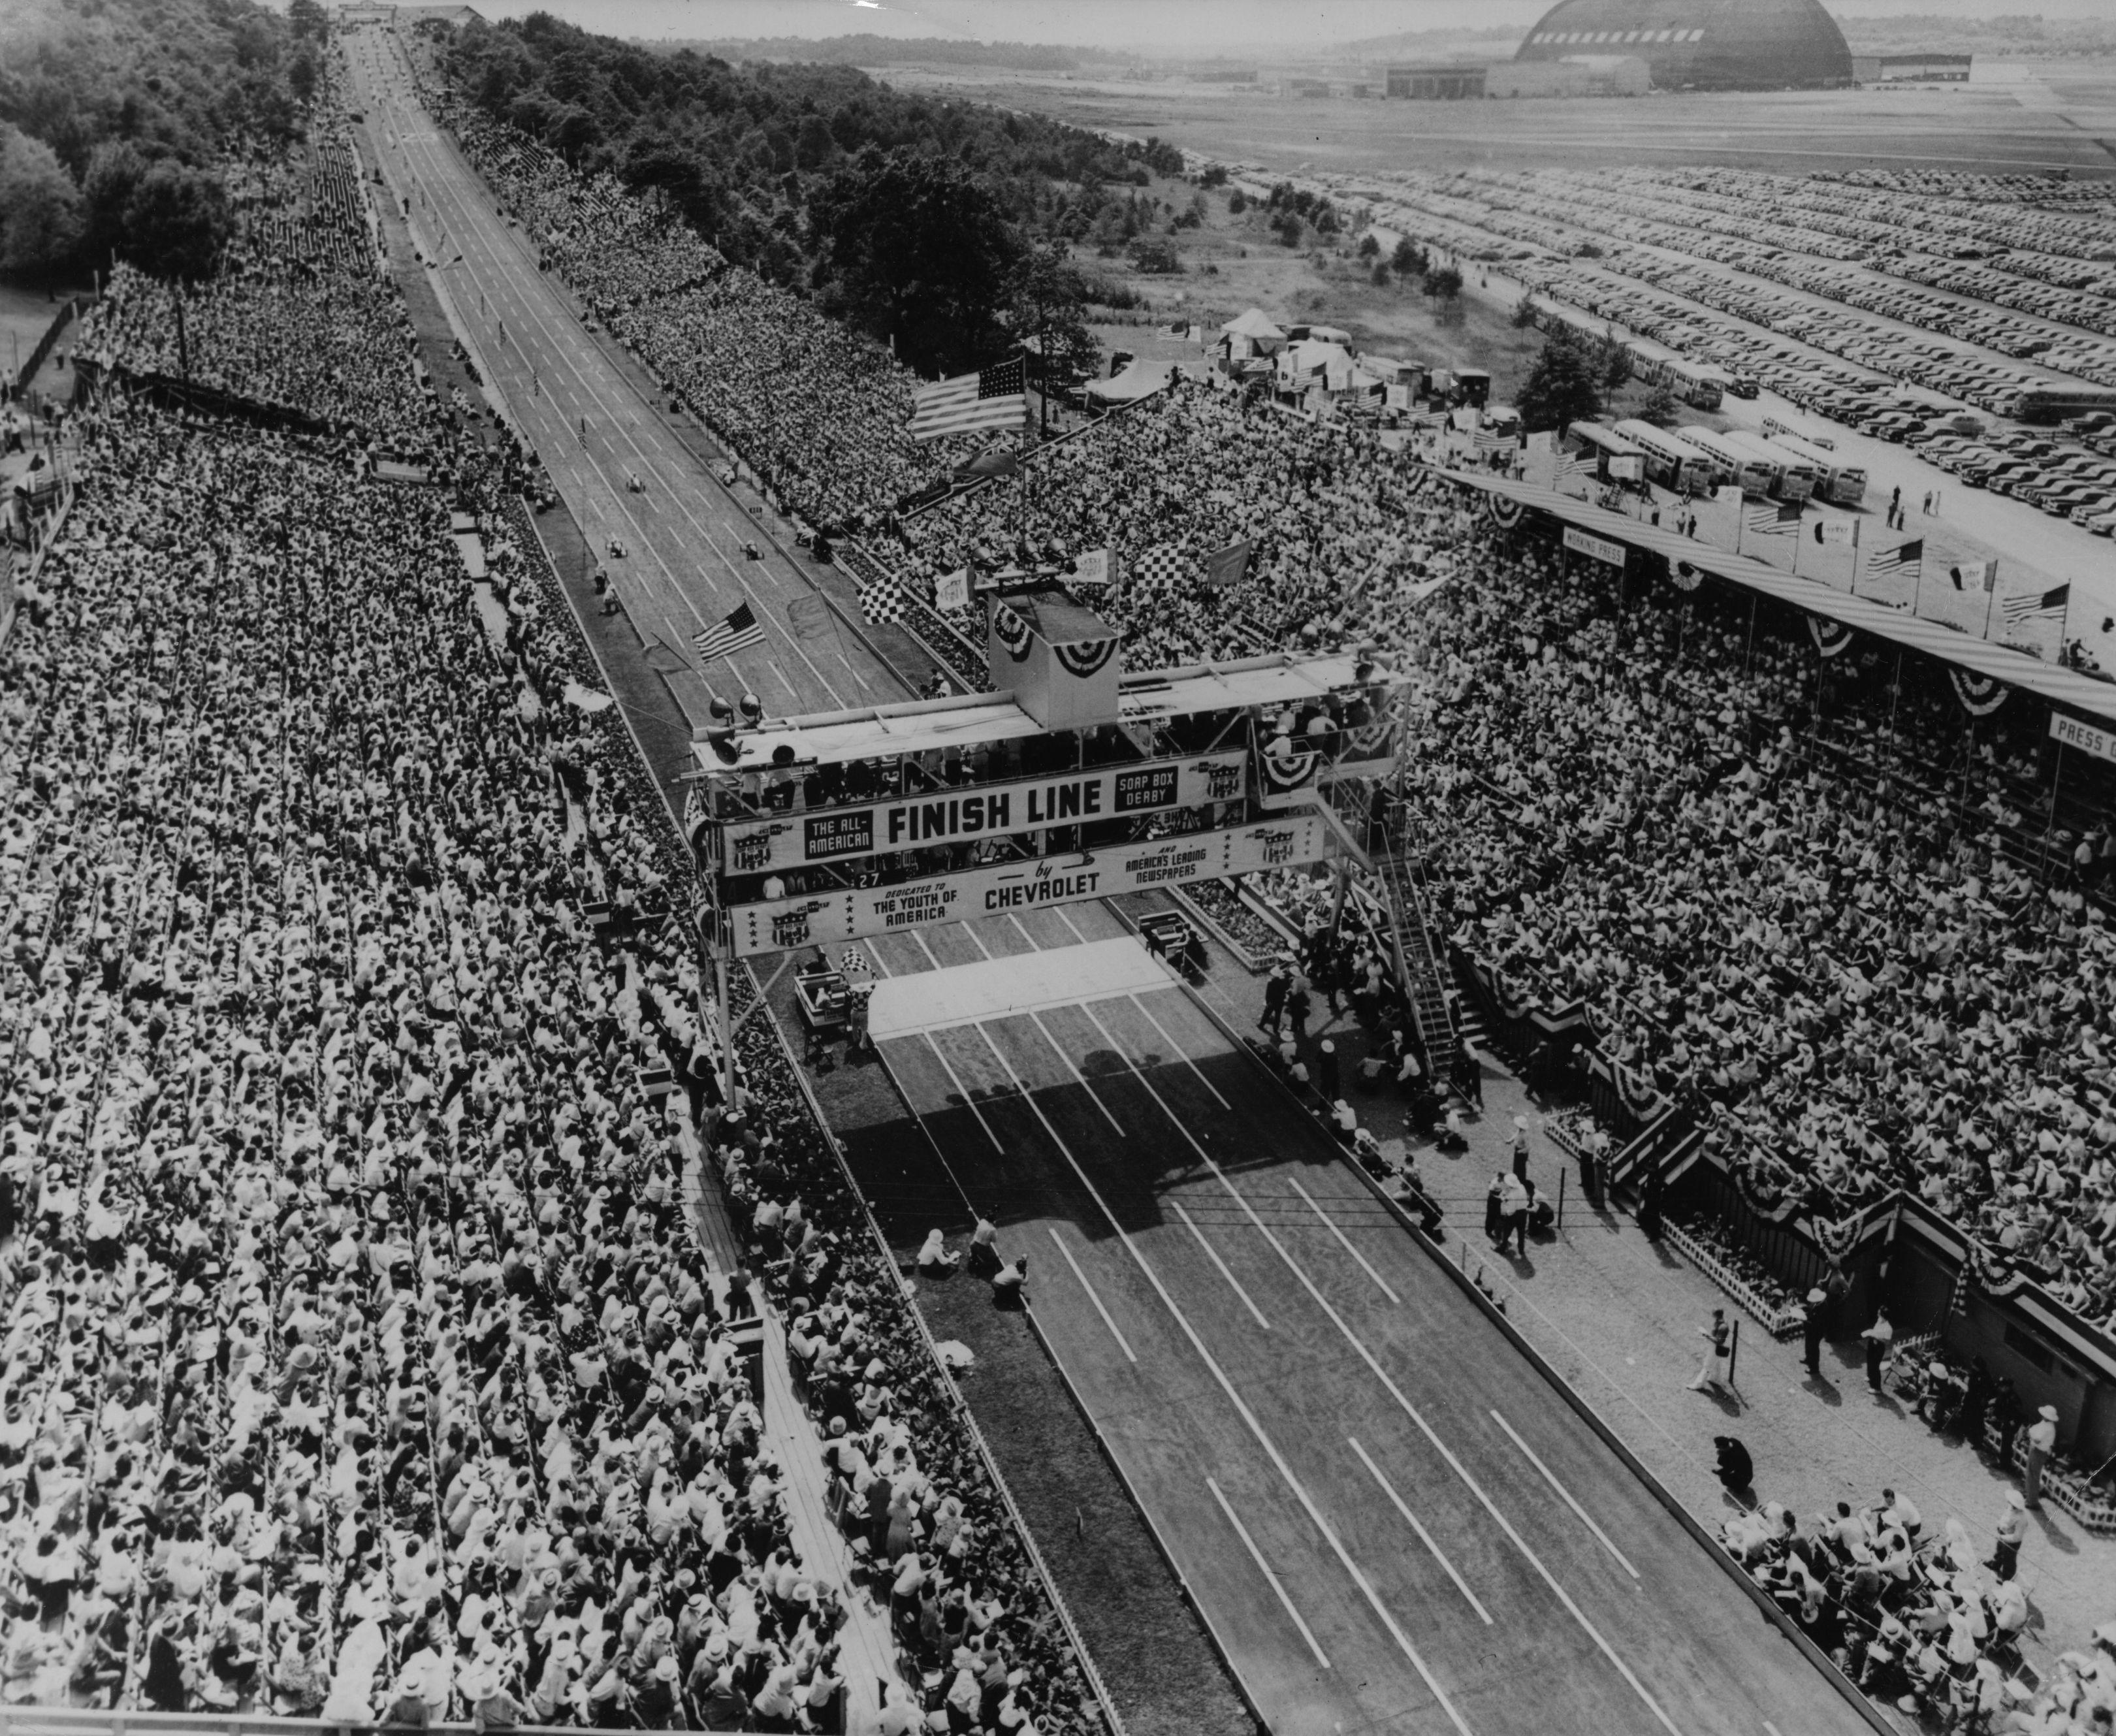 1948 All-American Soap Box Derby